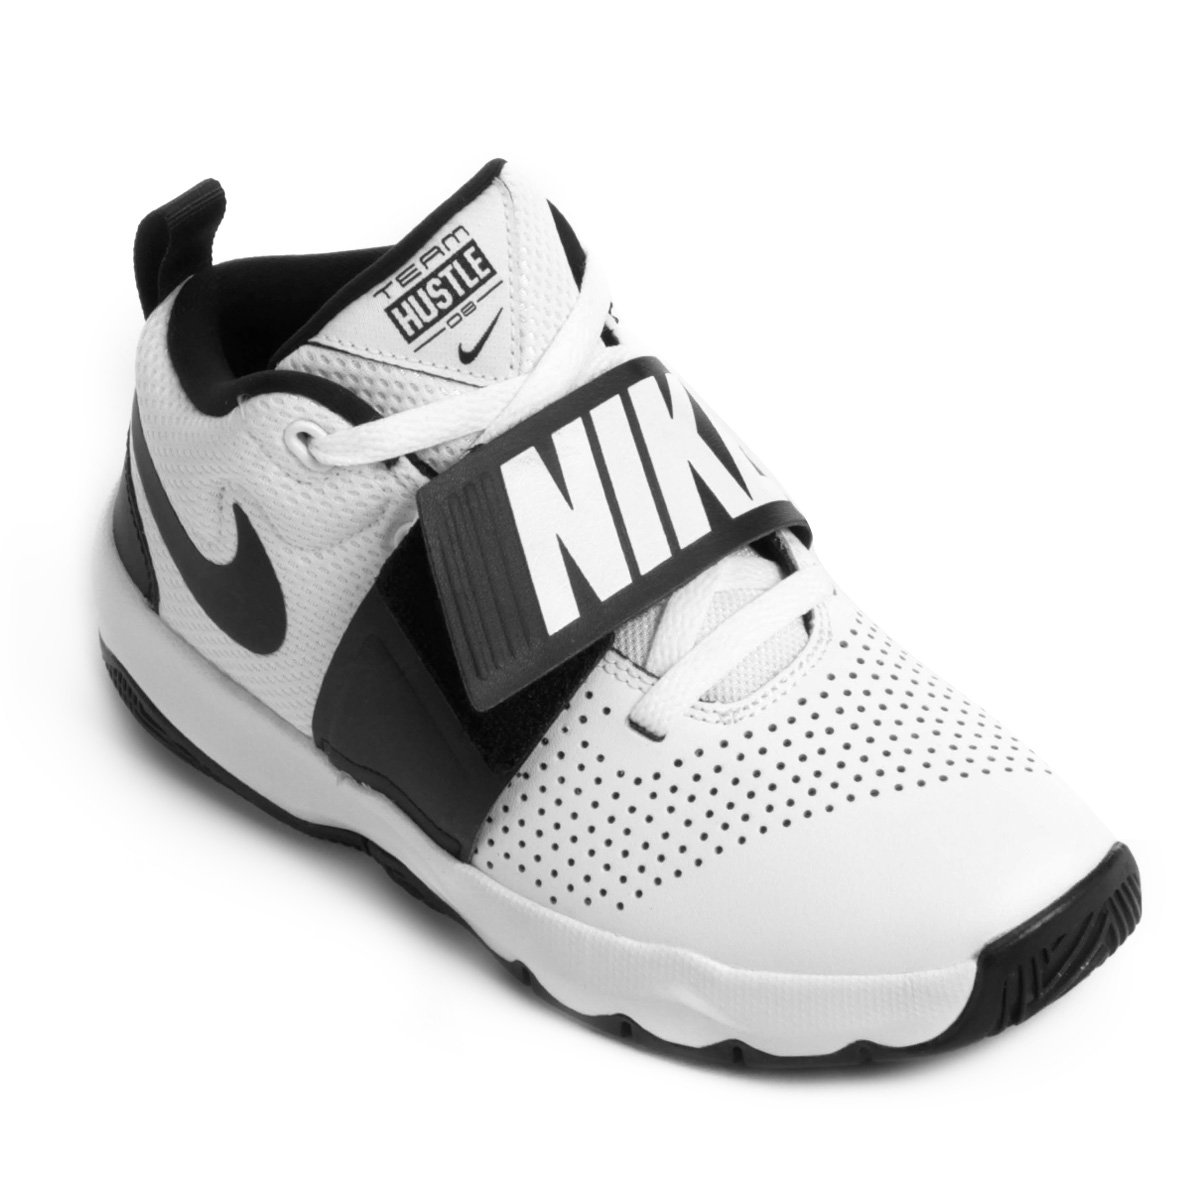 7de2192a2bc Shopping Smiles - Tênis Infantil Nike Team Hustle D8 Masculino